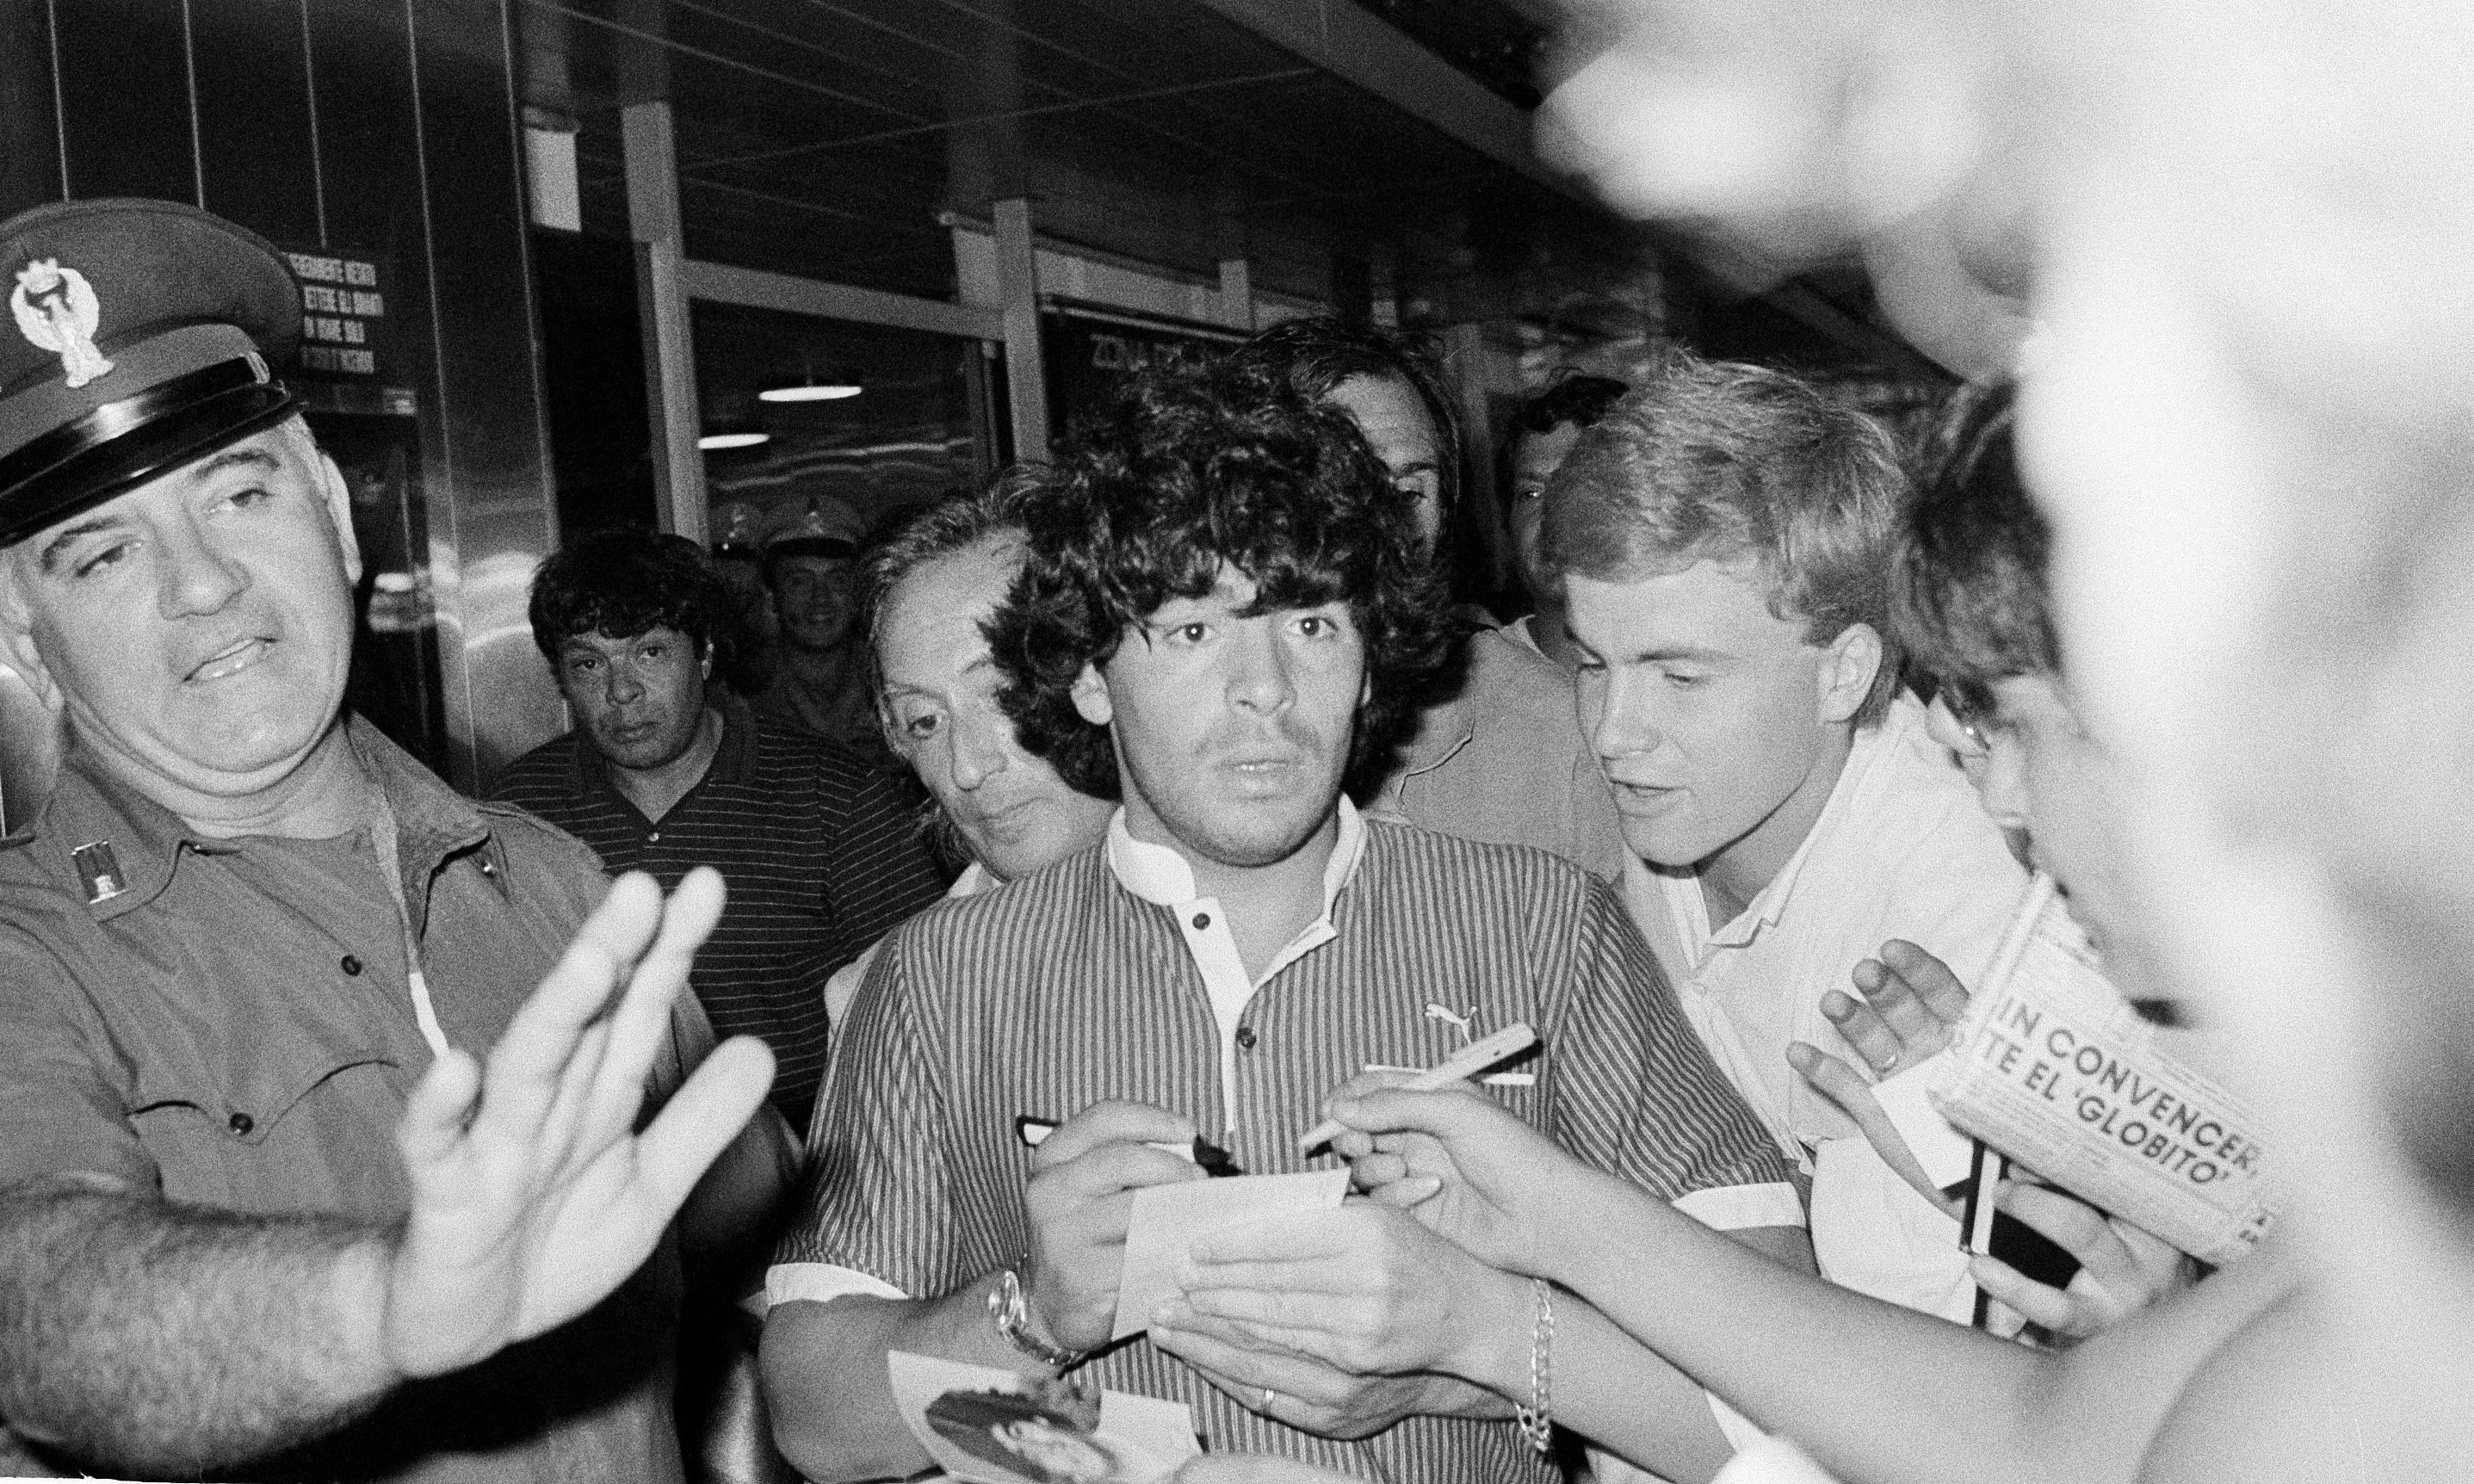 Maradona film reminds that untameables were not always untouchable